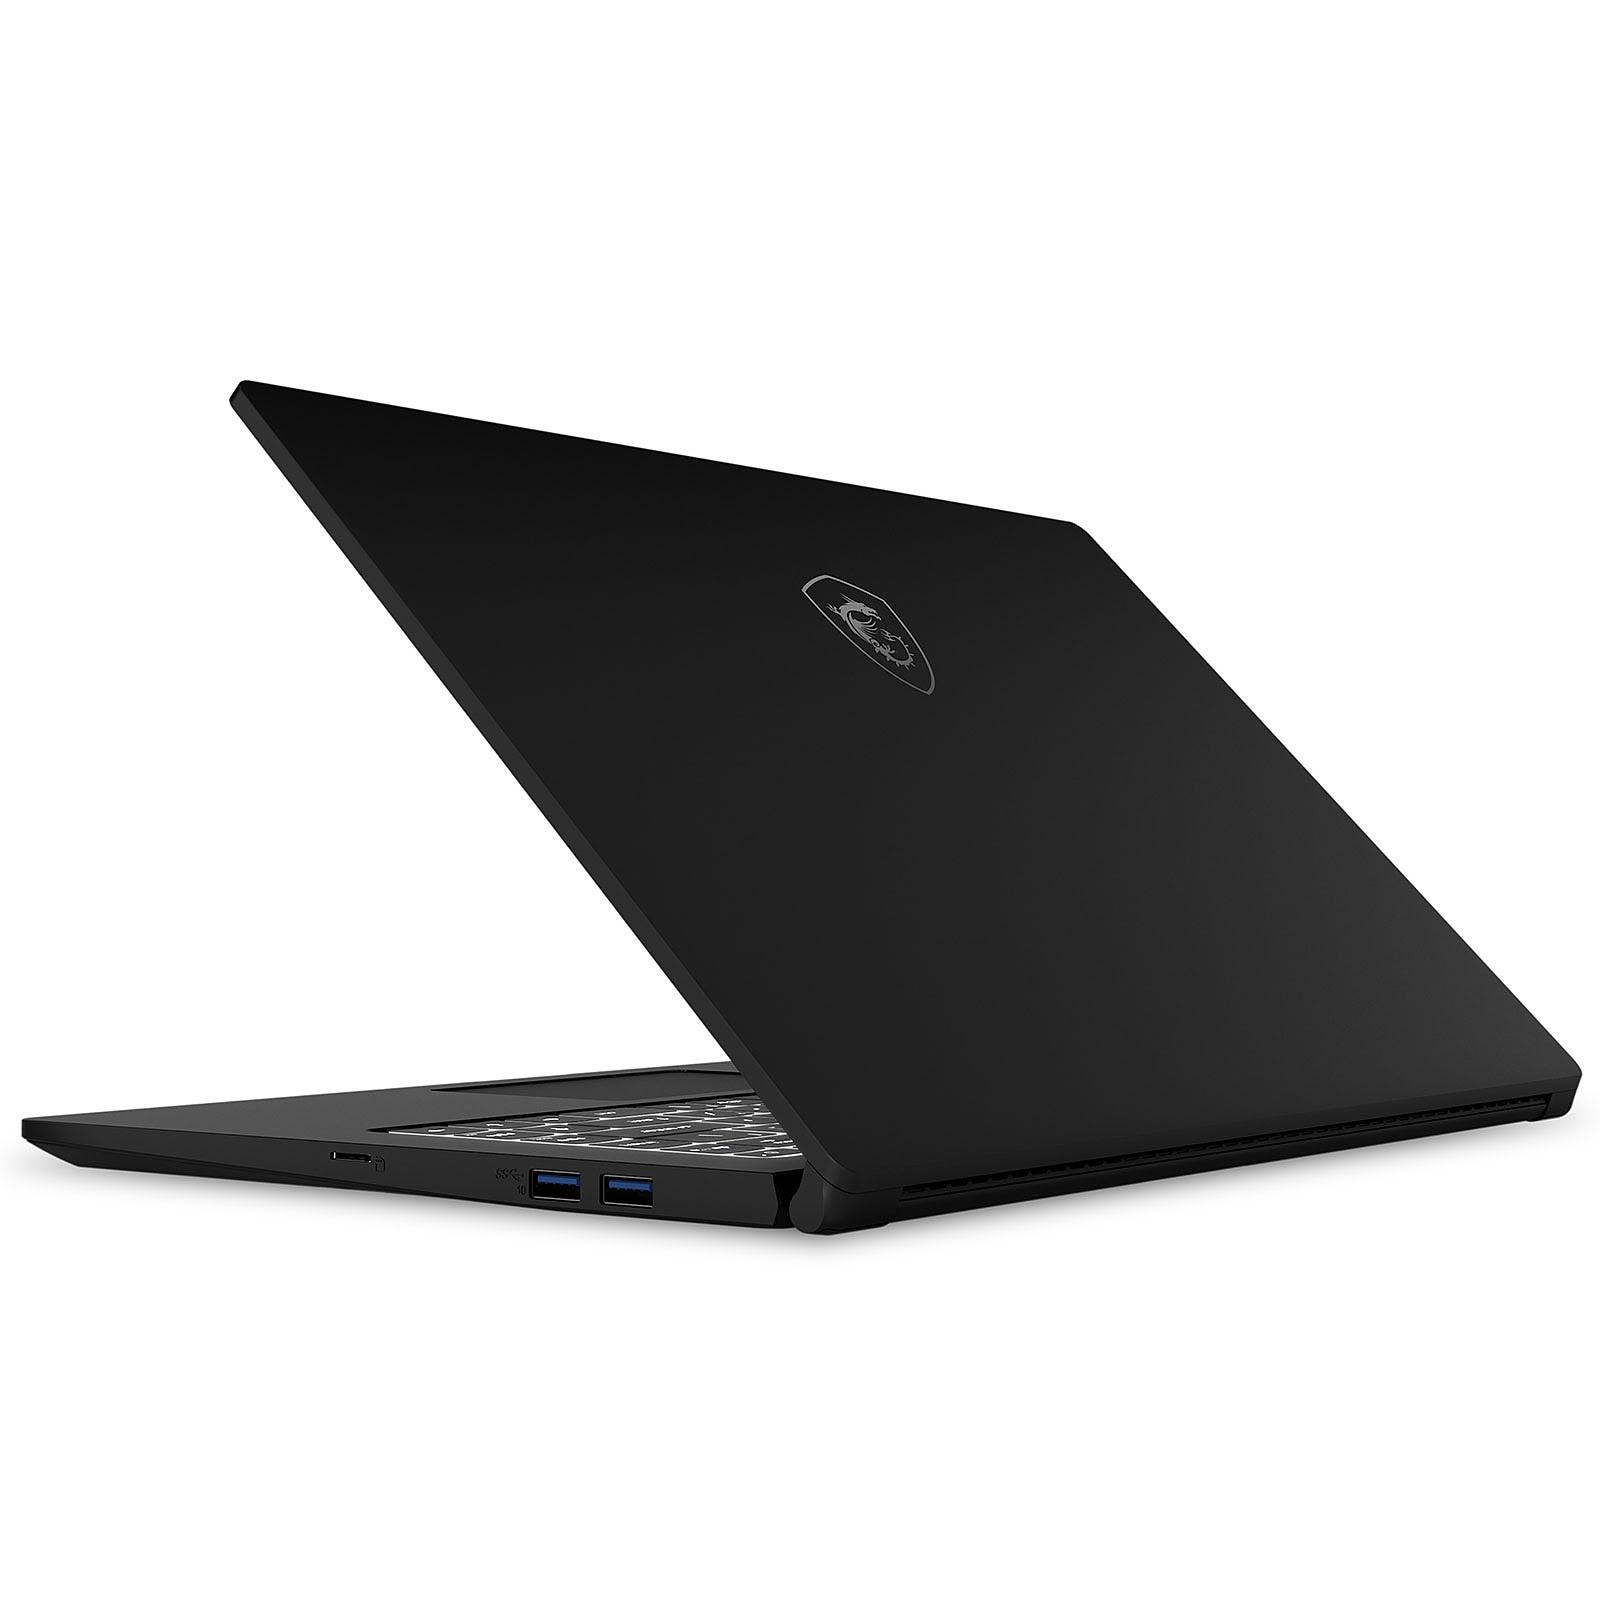 MSI 9S7-155136-464 - PC portable MSI - Cybertek.fr - 1